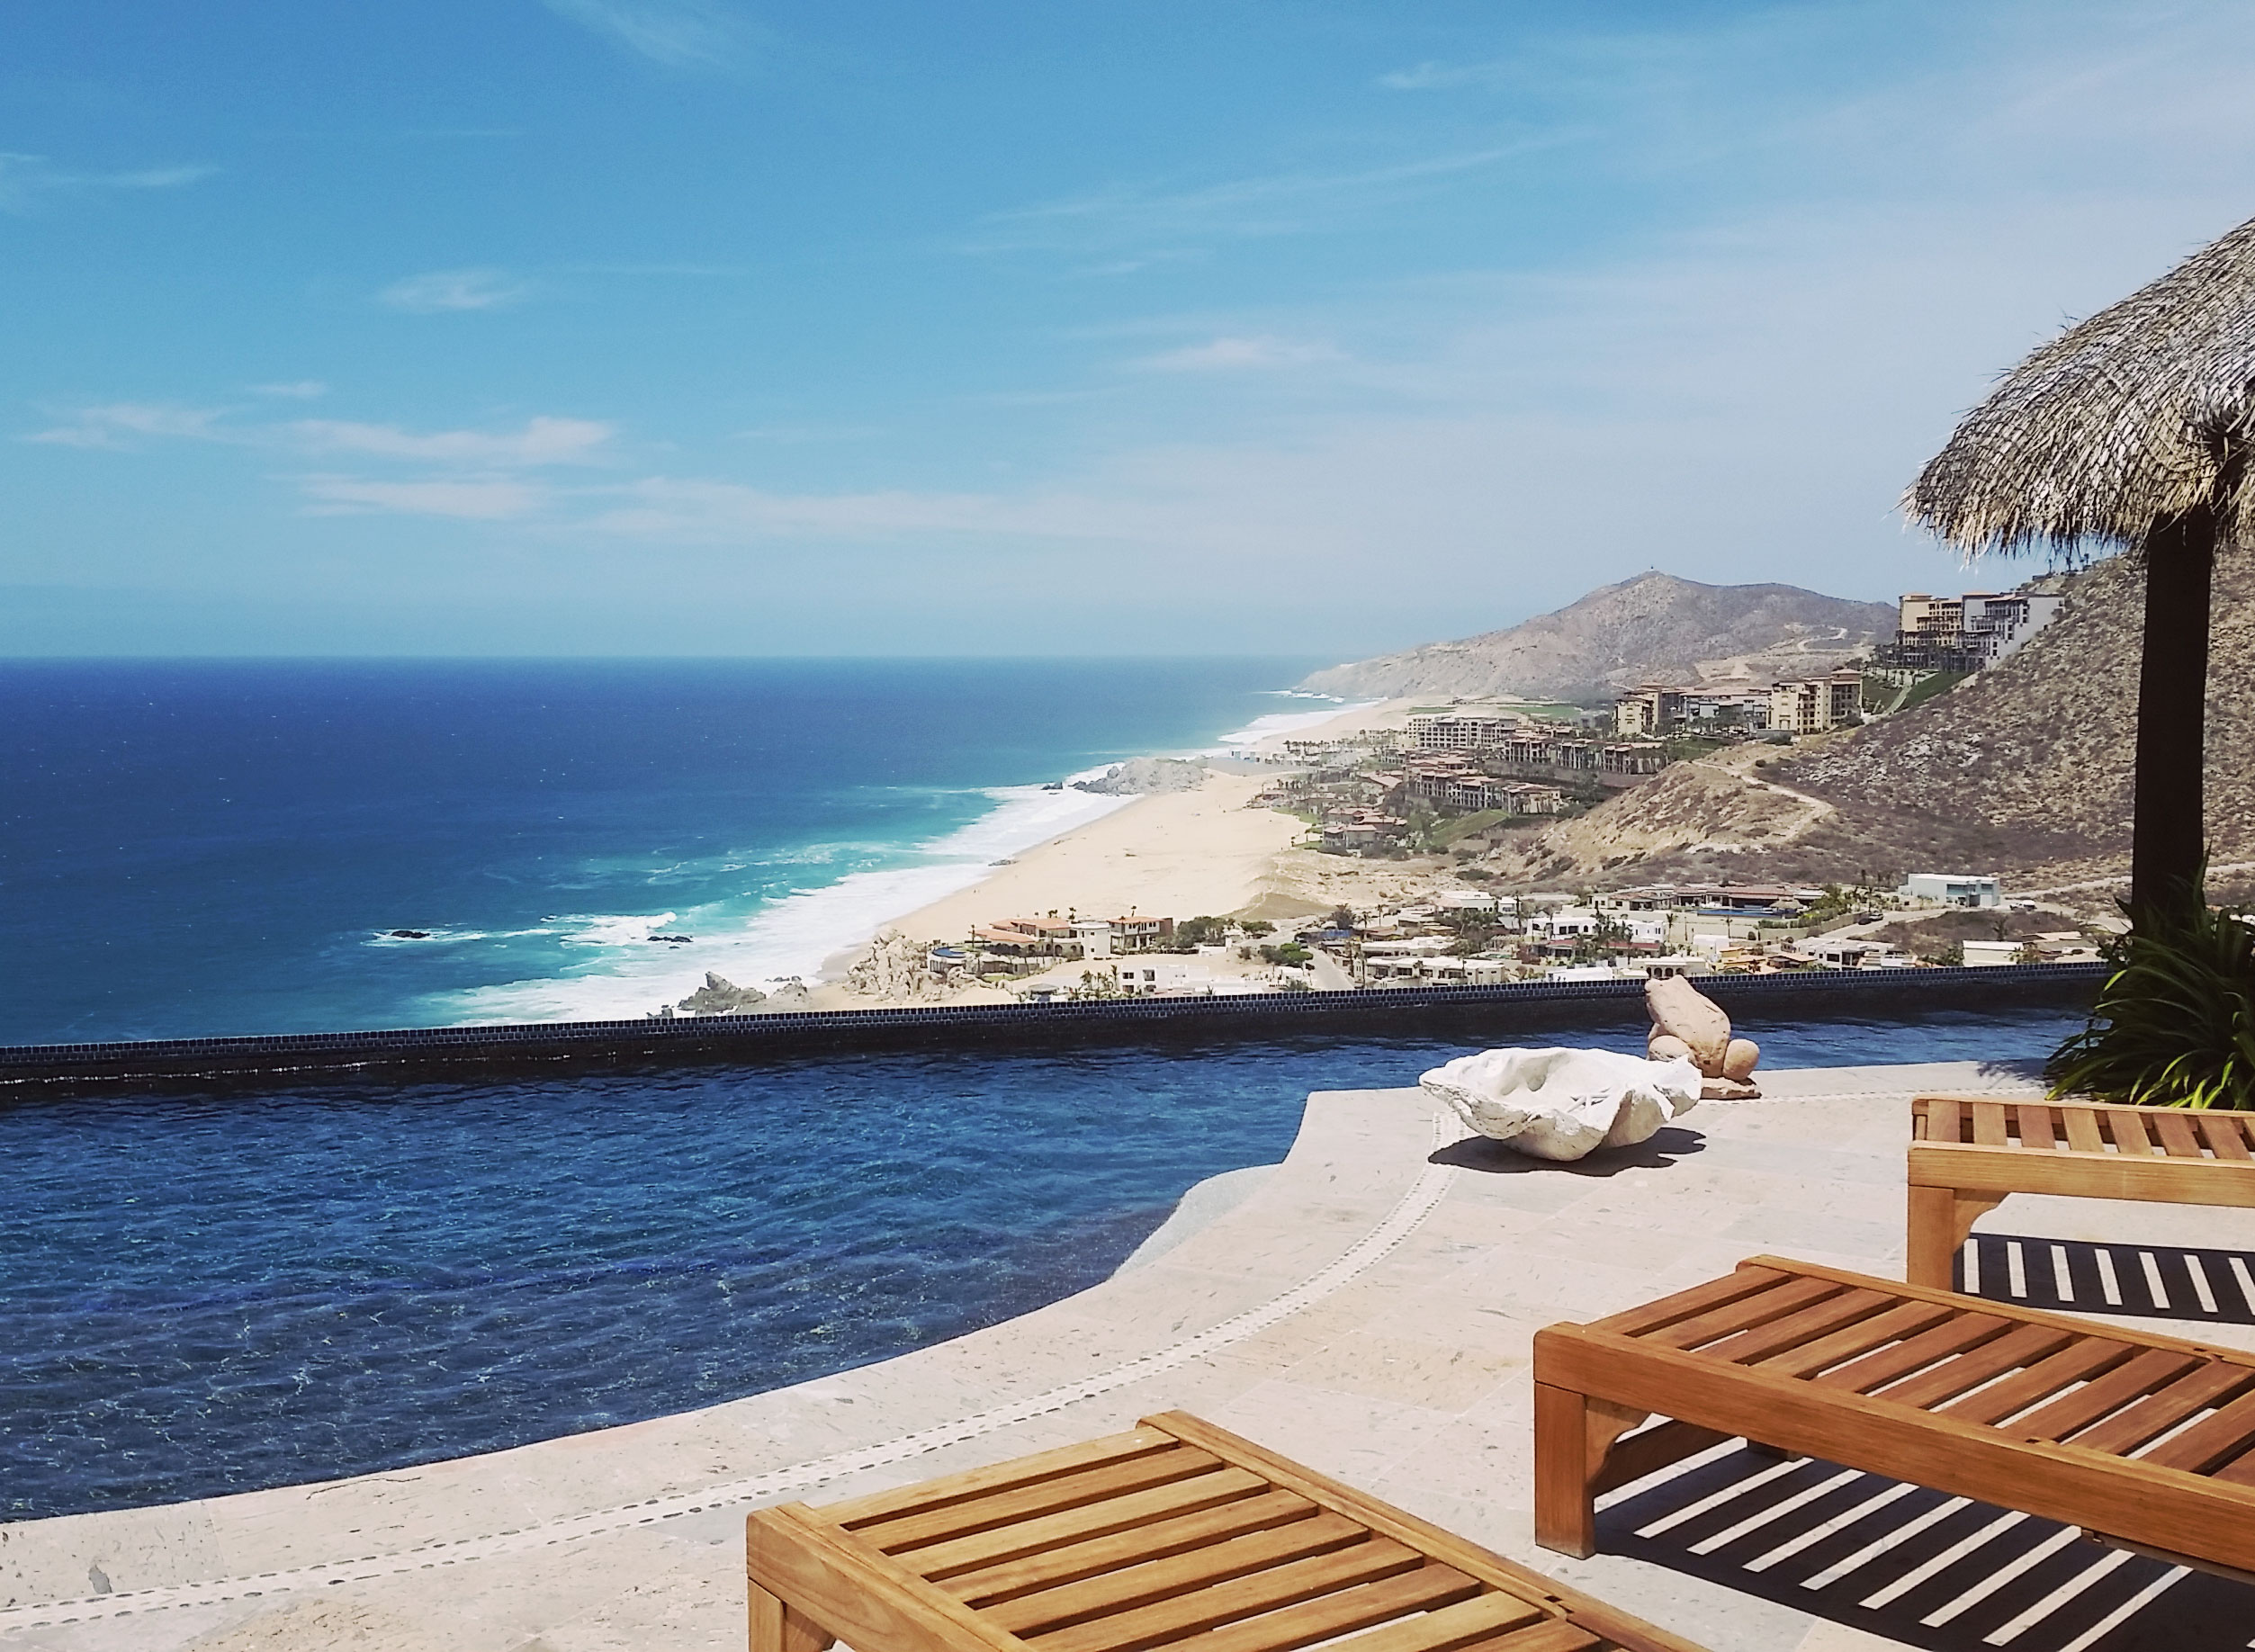 Luxury Vacation Rental Villa Turquesa in Cabo San Lucas